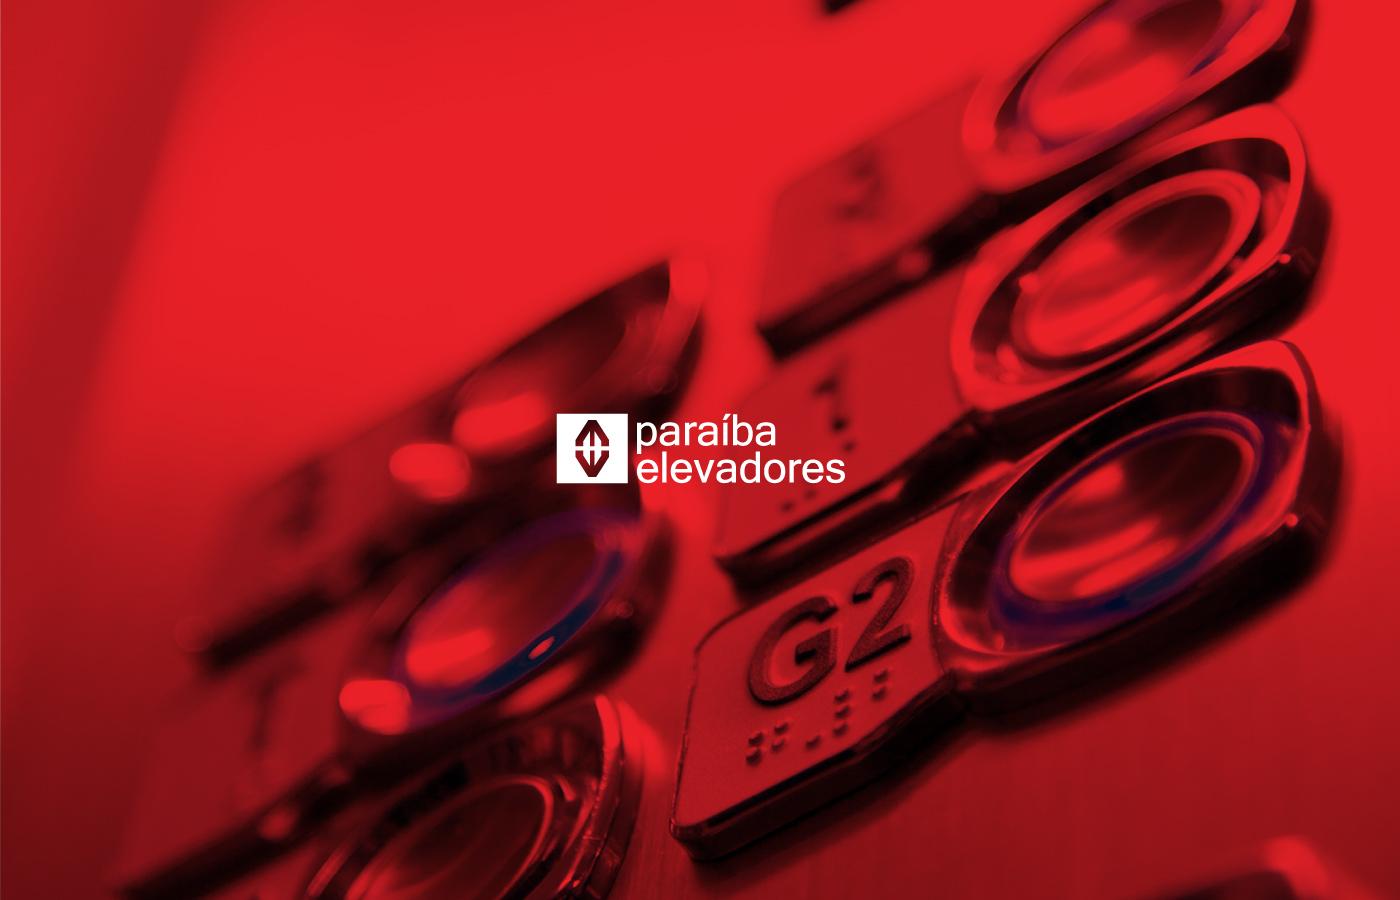 paraiba-1400x900px-12